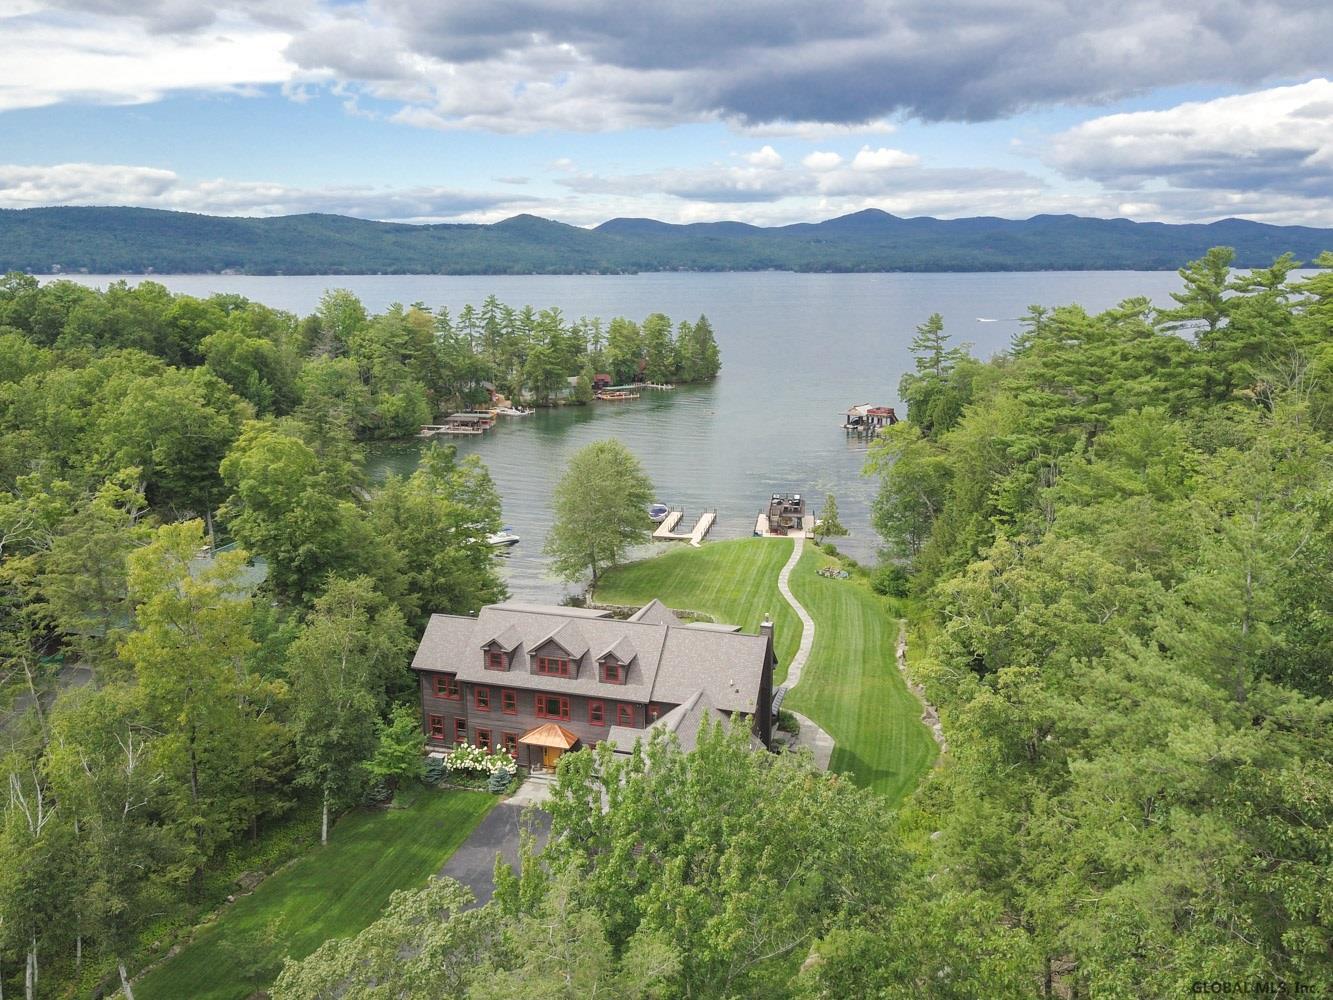 Kattskill Bay image 78